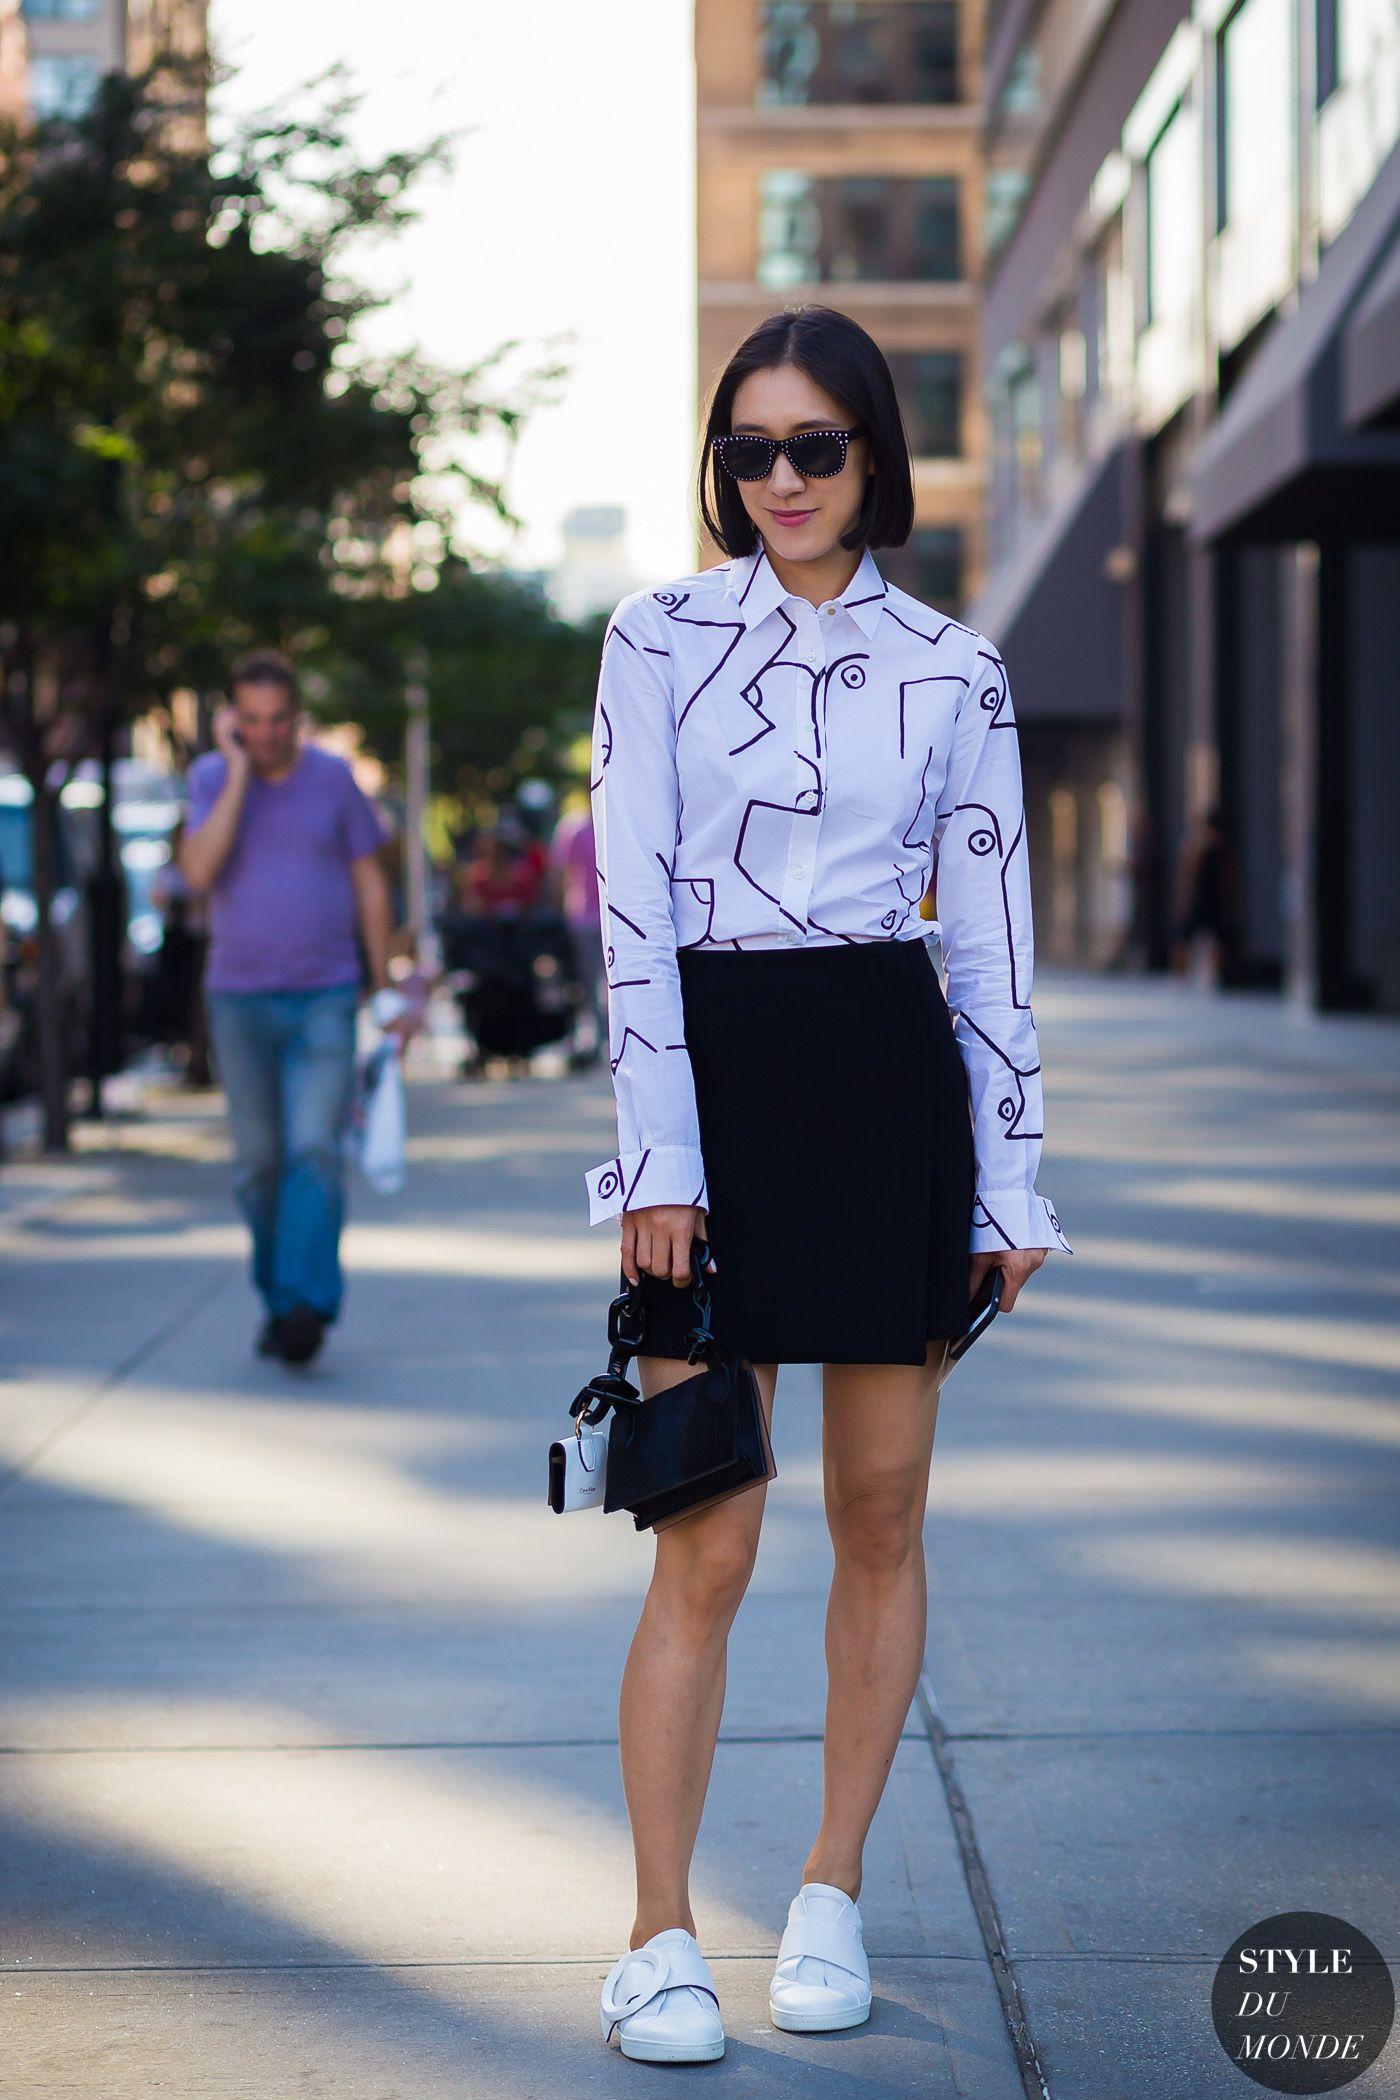 988c6a3916 New York Fashion Week SS 2016 Street Style: Eva Chen     STREET ...